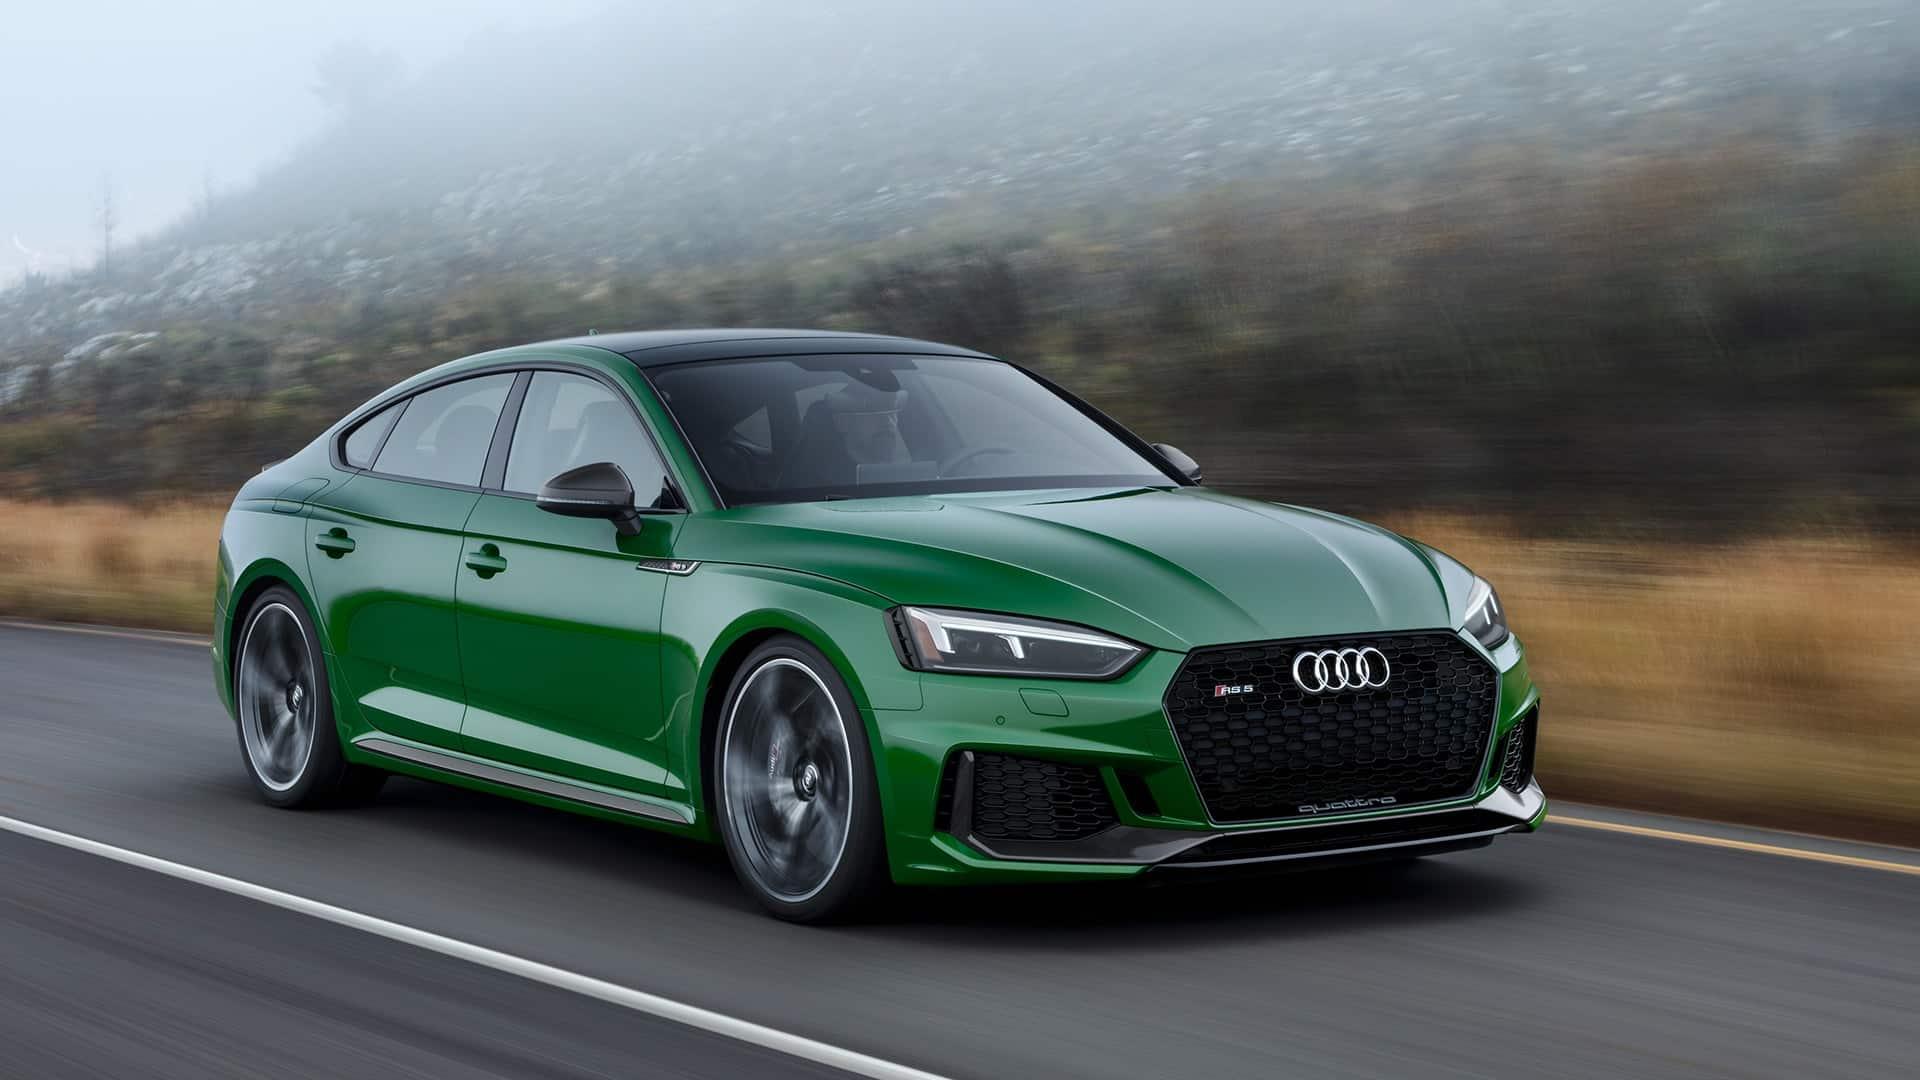 2019 RS 5 Sportback > A5 > Audi Canada